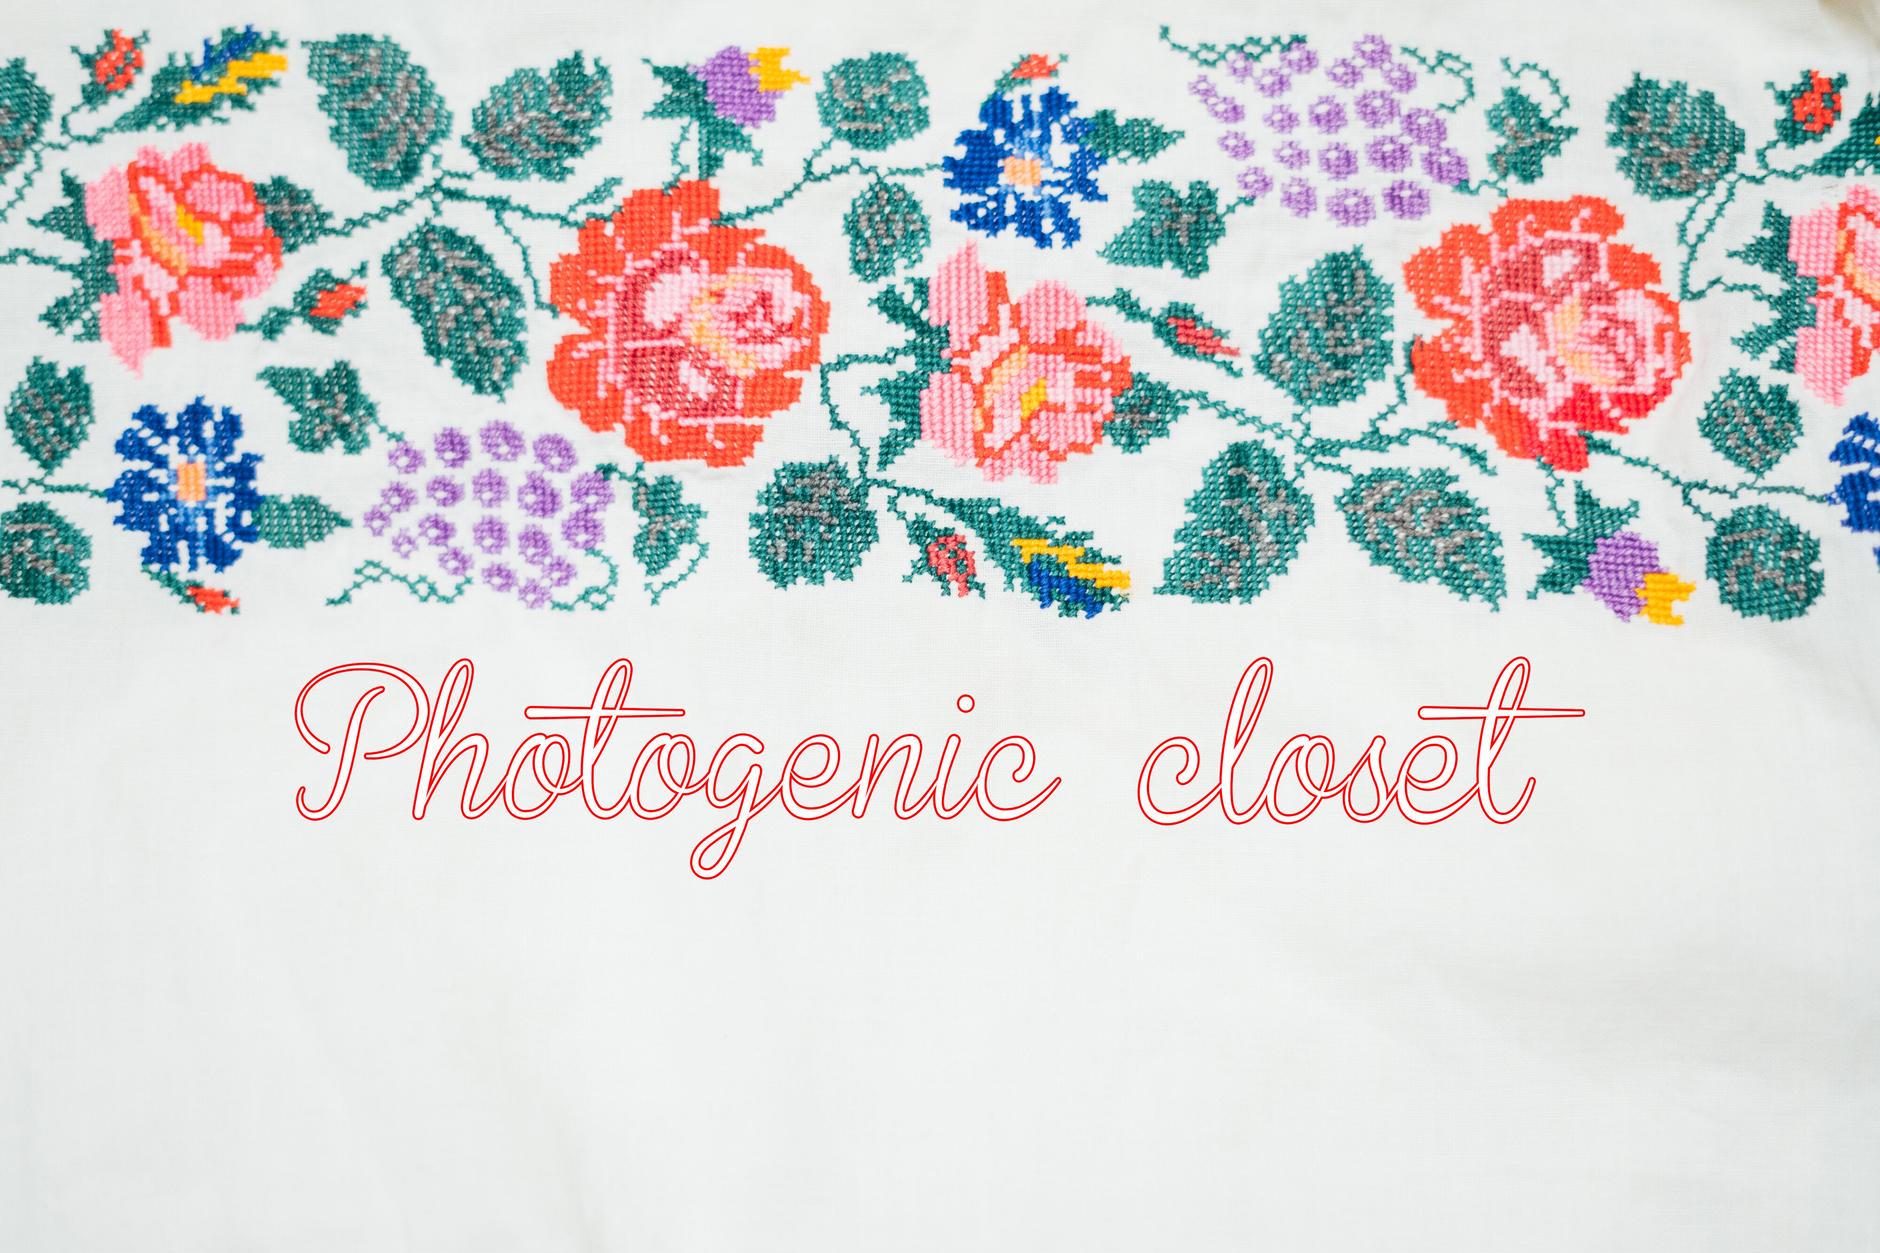 Photogenic closet